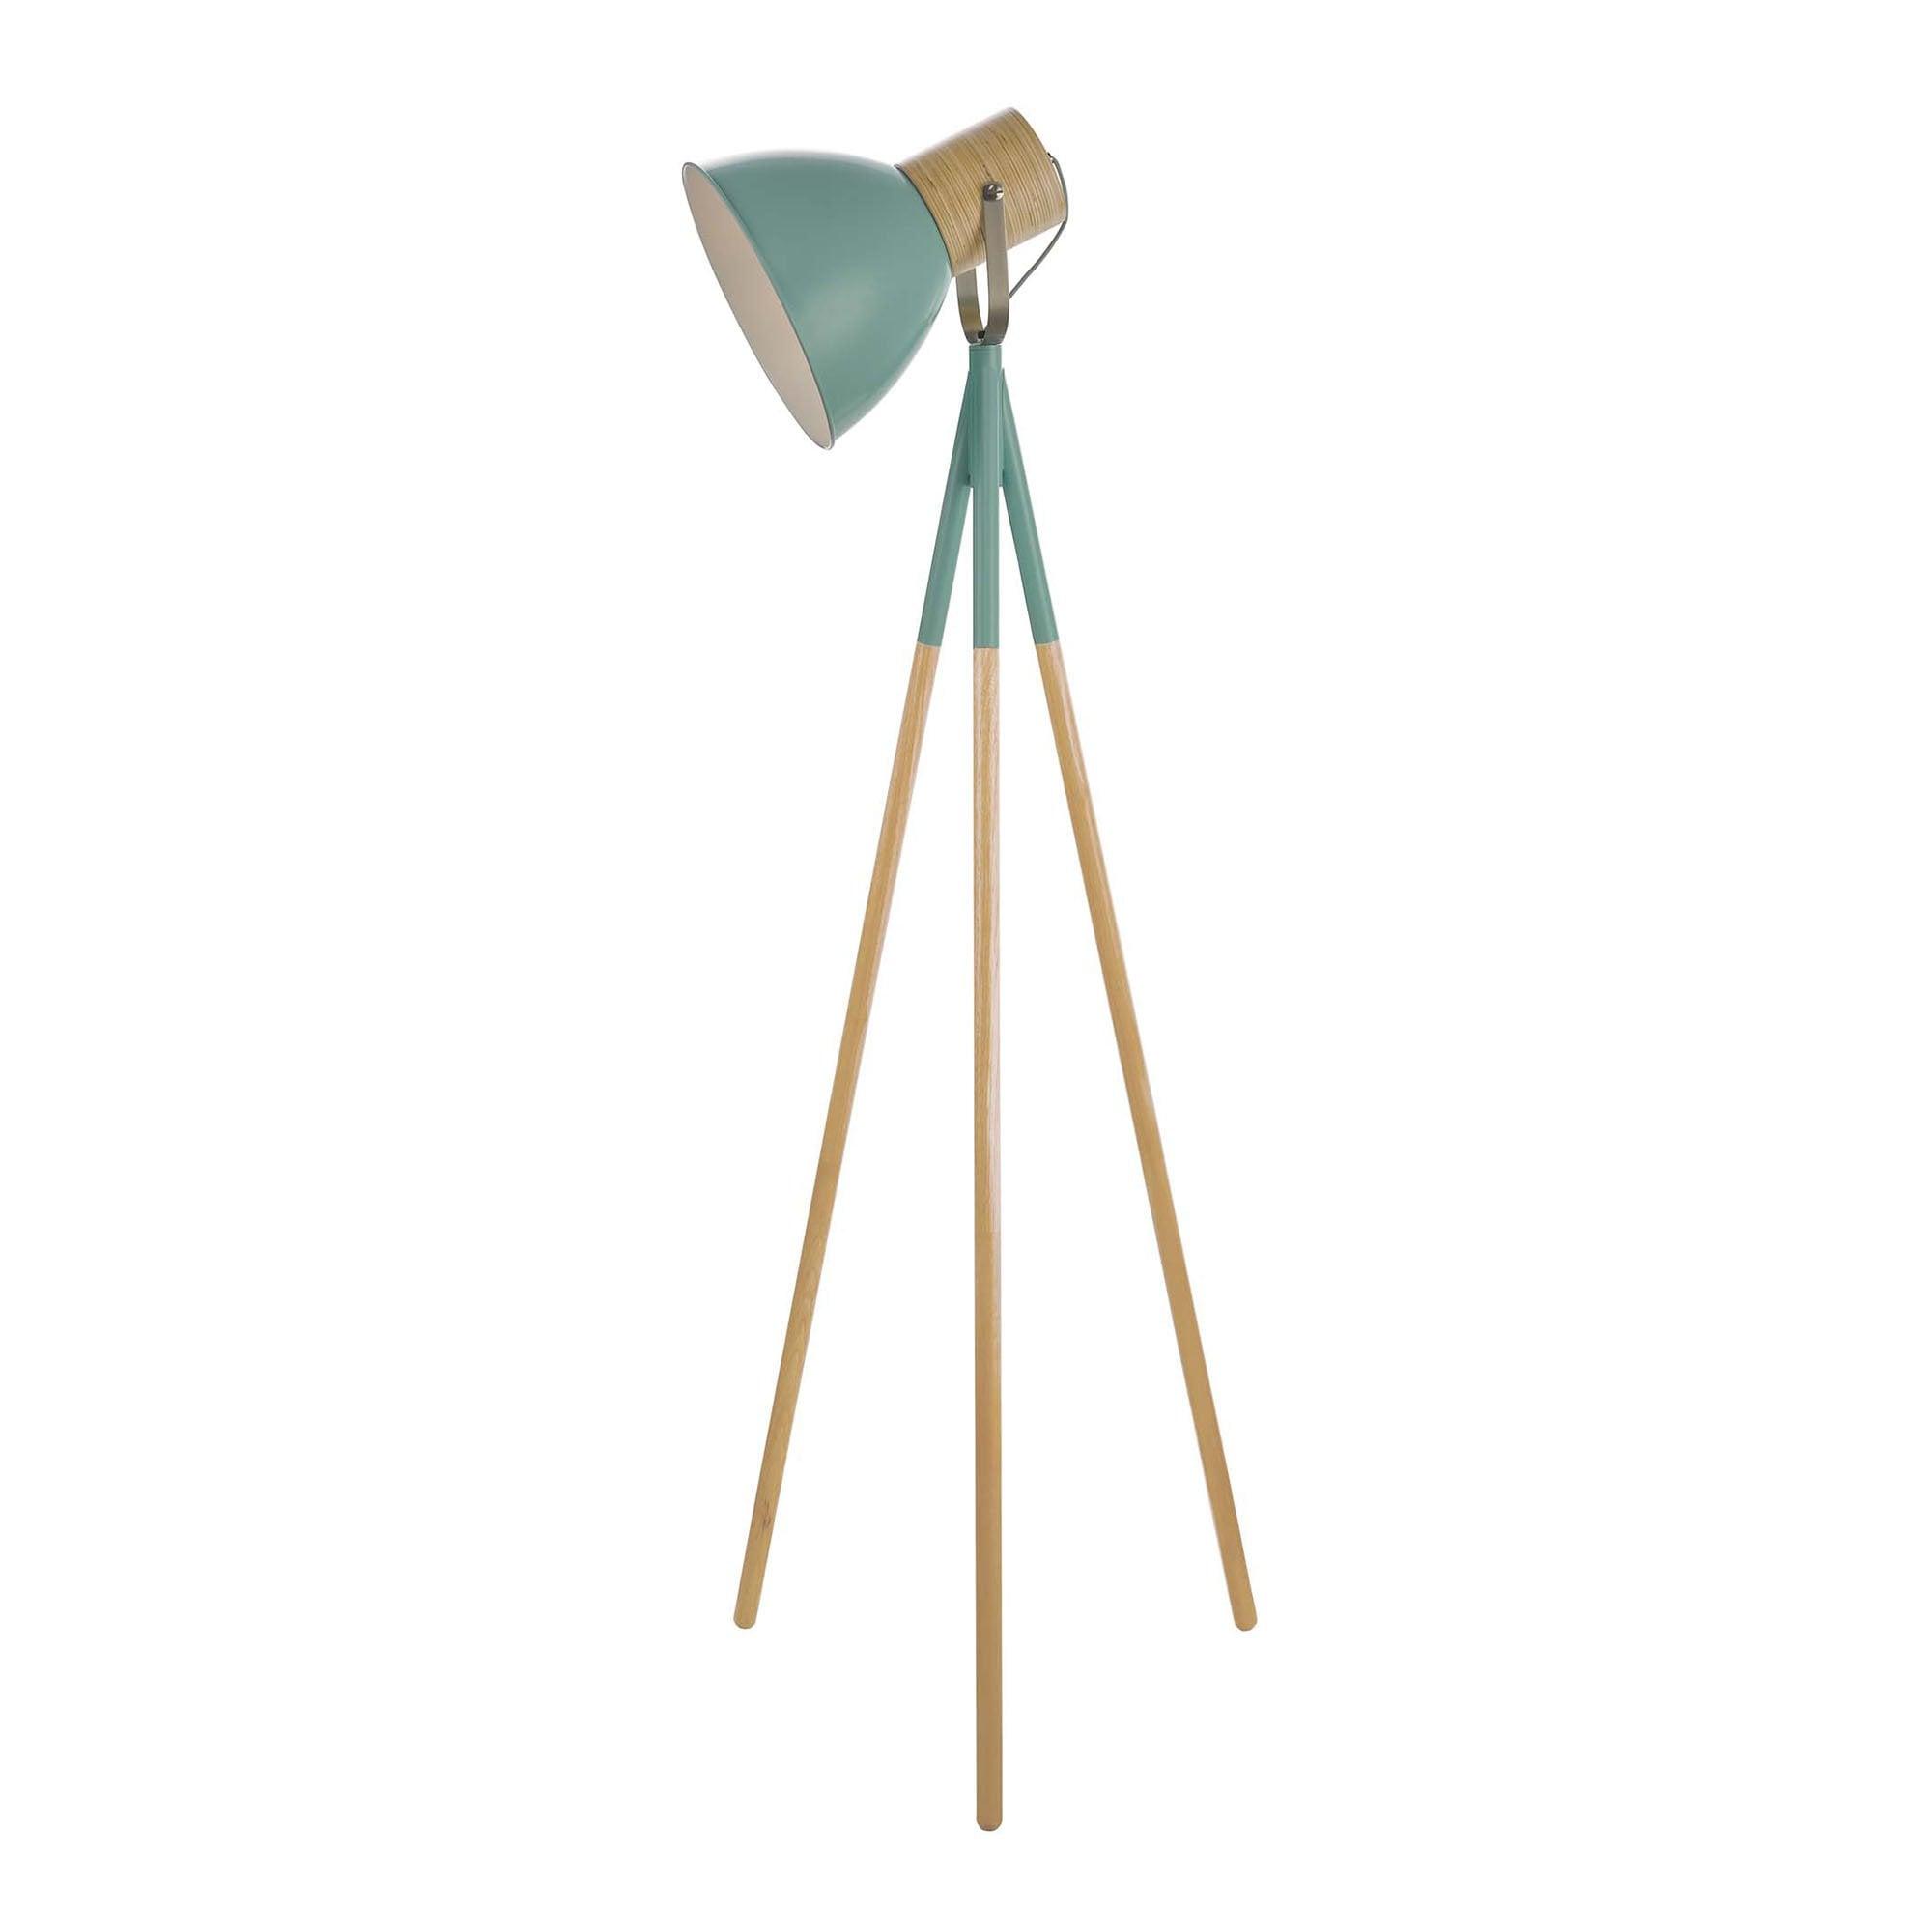 Scandinavian style table lamp